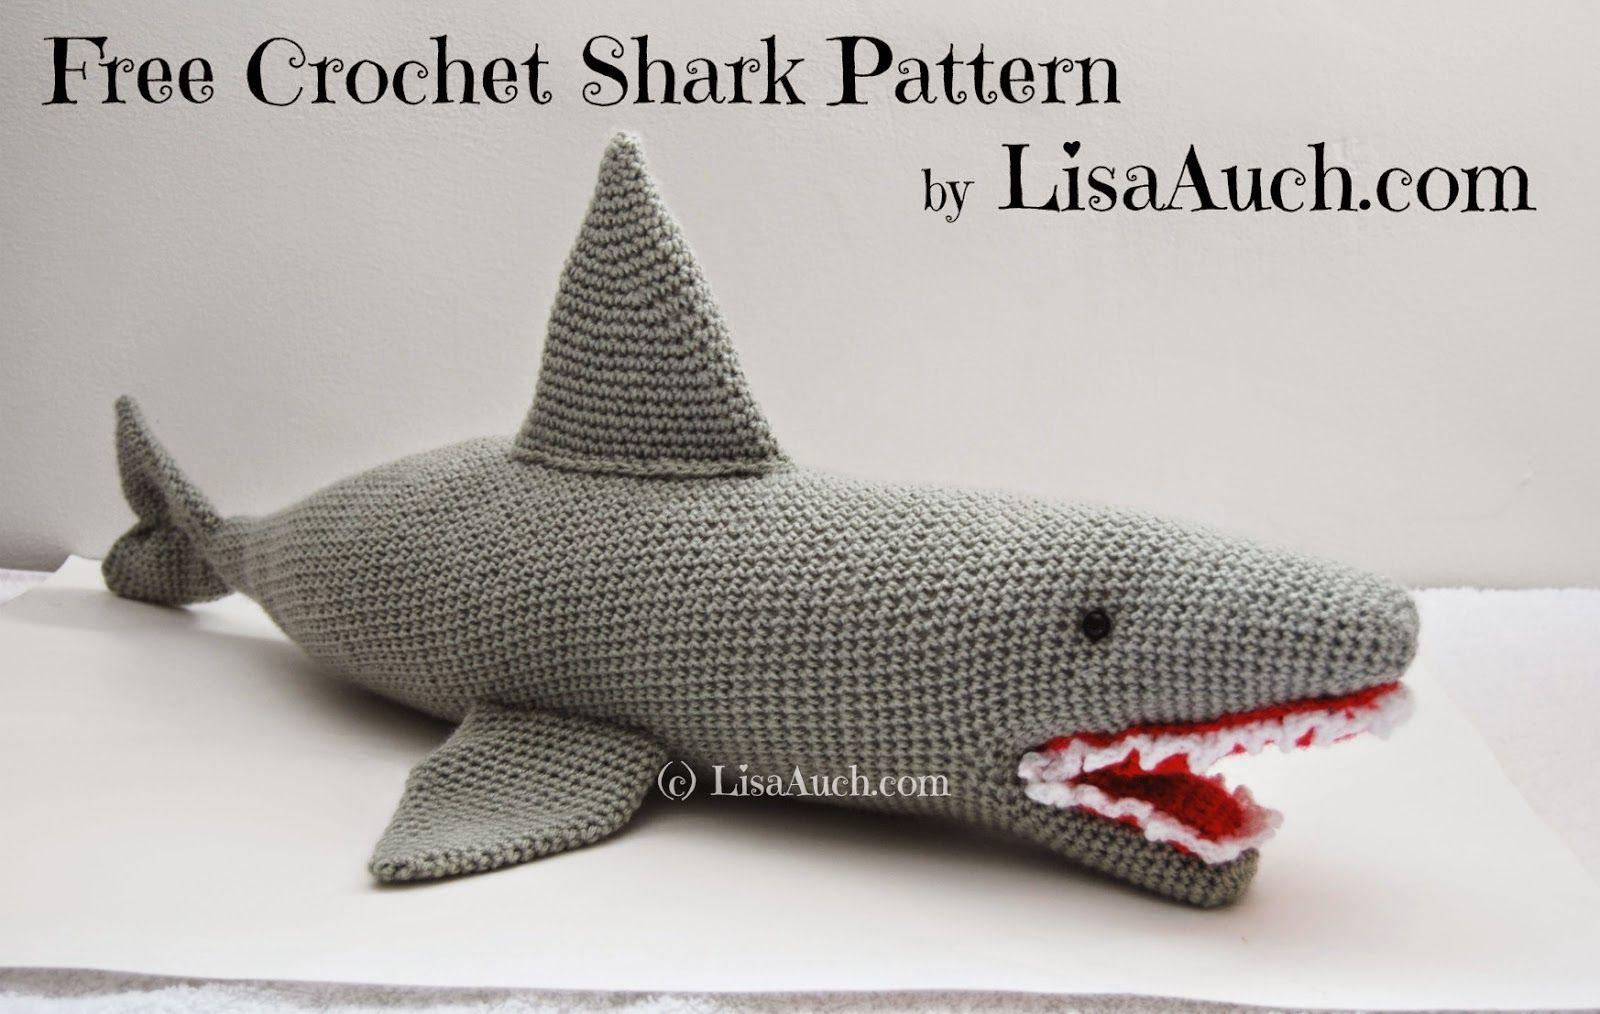 FREE Crochet Shark Pattern | Crochet shark, Free crochet and Shark